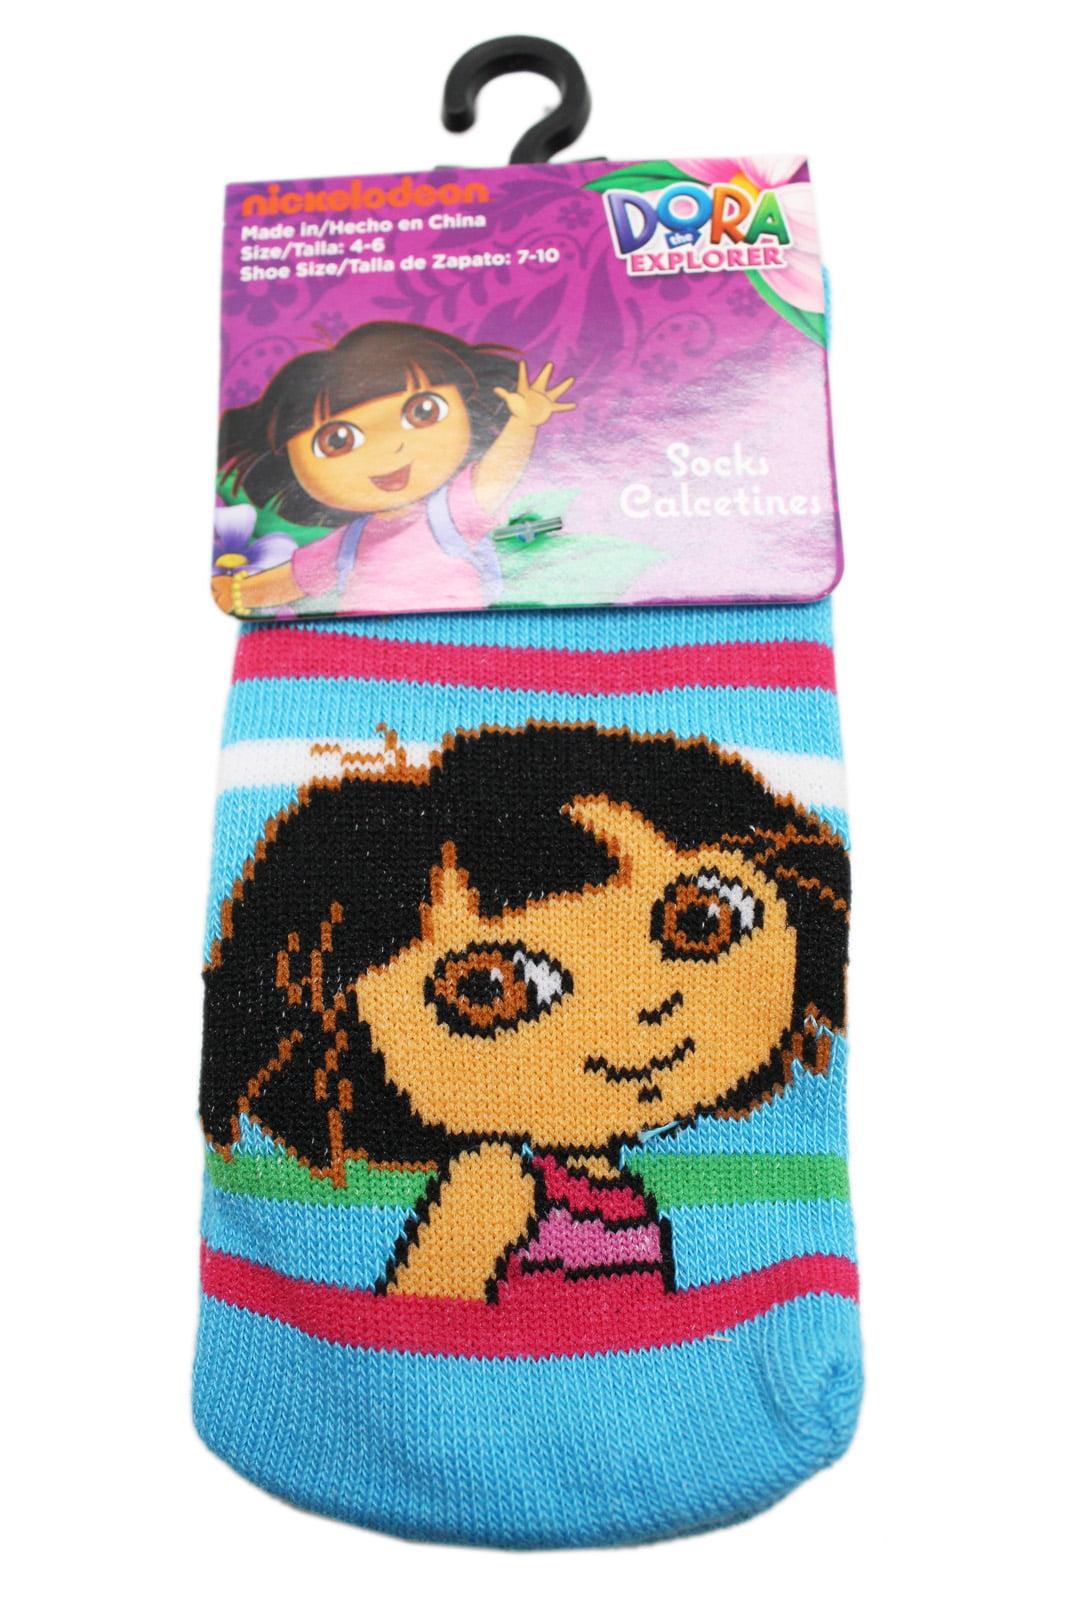 Dora the Explorer Striped Blue Colored Toddler Socks (1 Pair. Size 4-6)